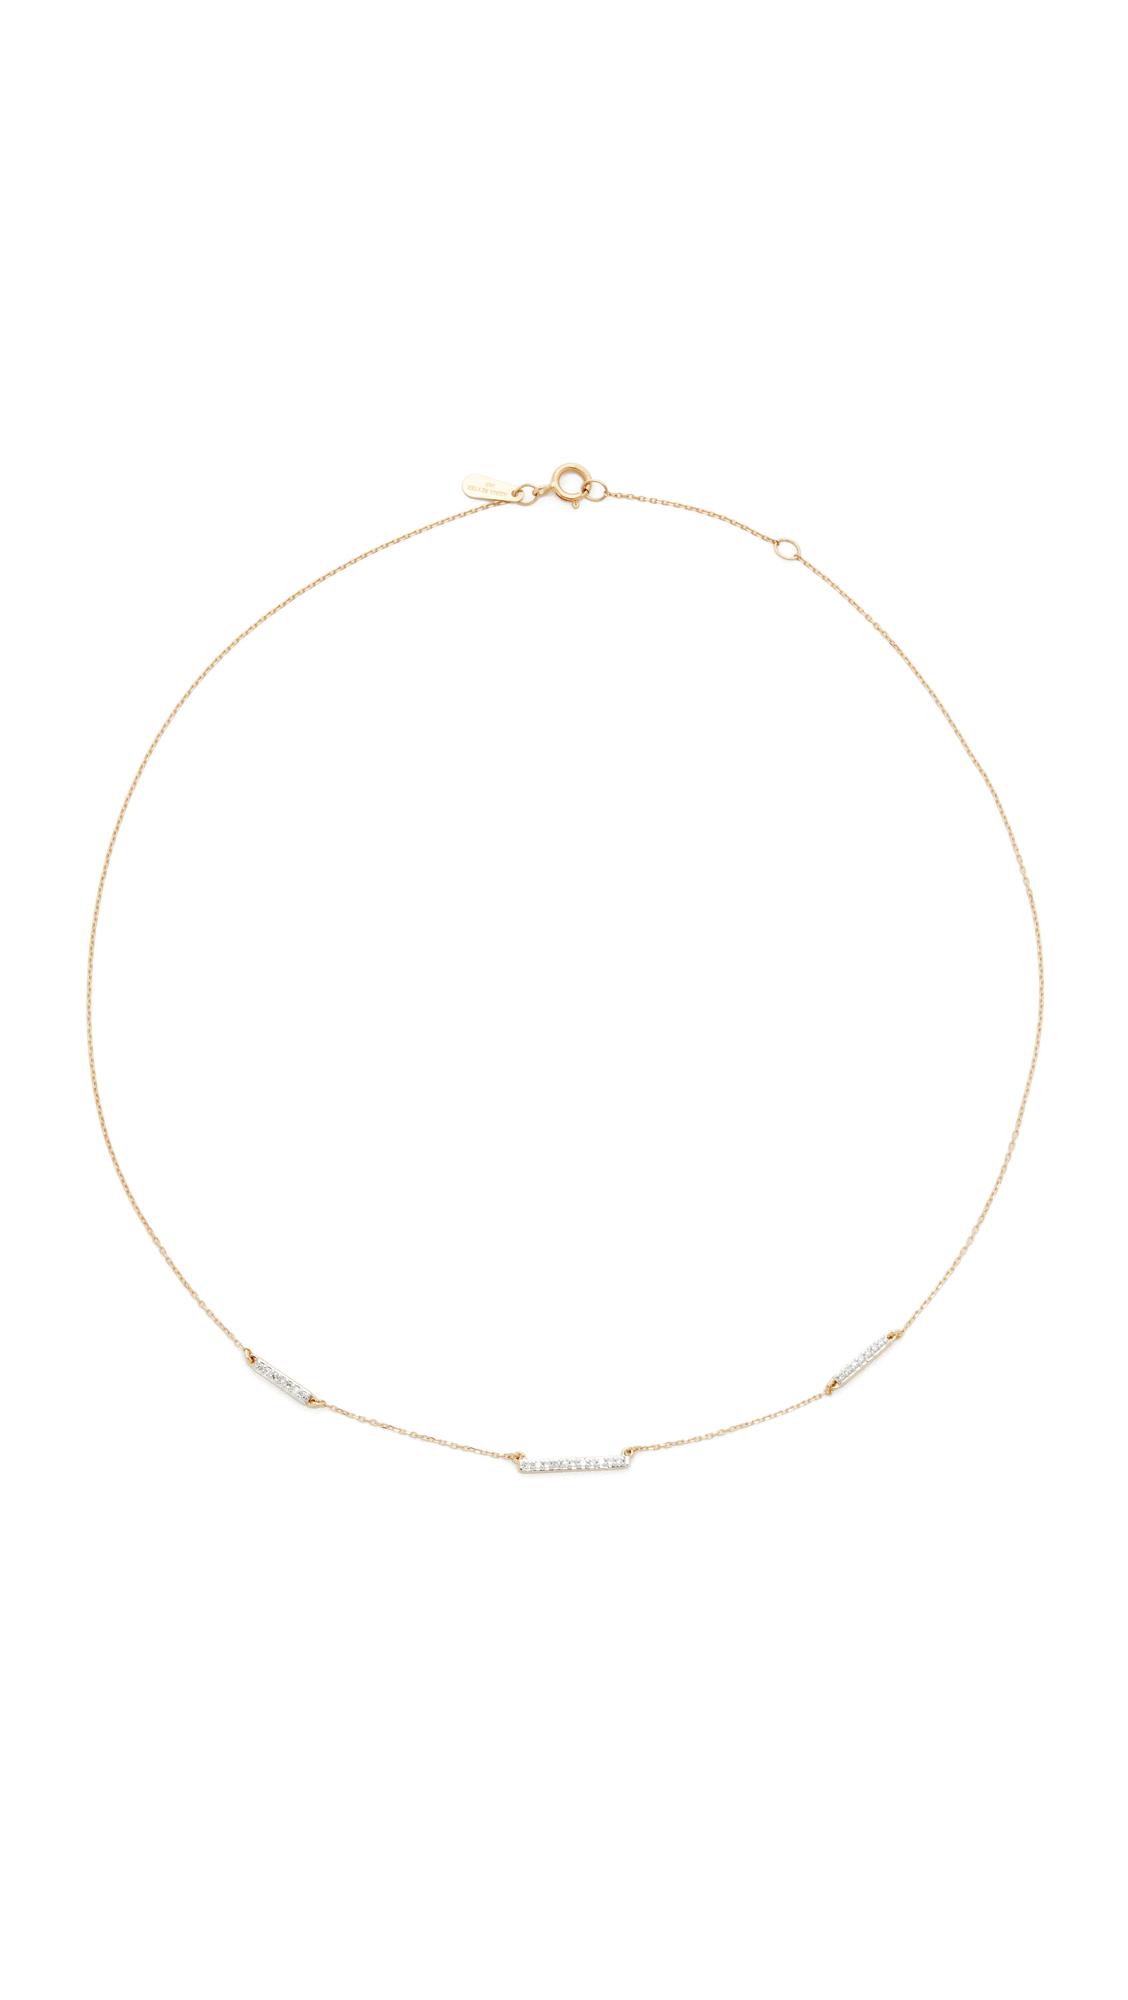 Adina Reyter 14k Gold Pave 3 Bar Chain Choker Necklace - Gold